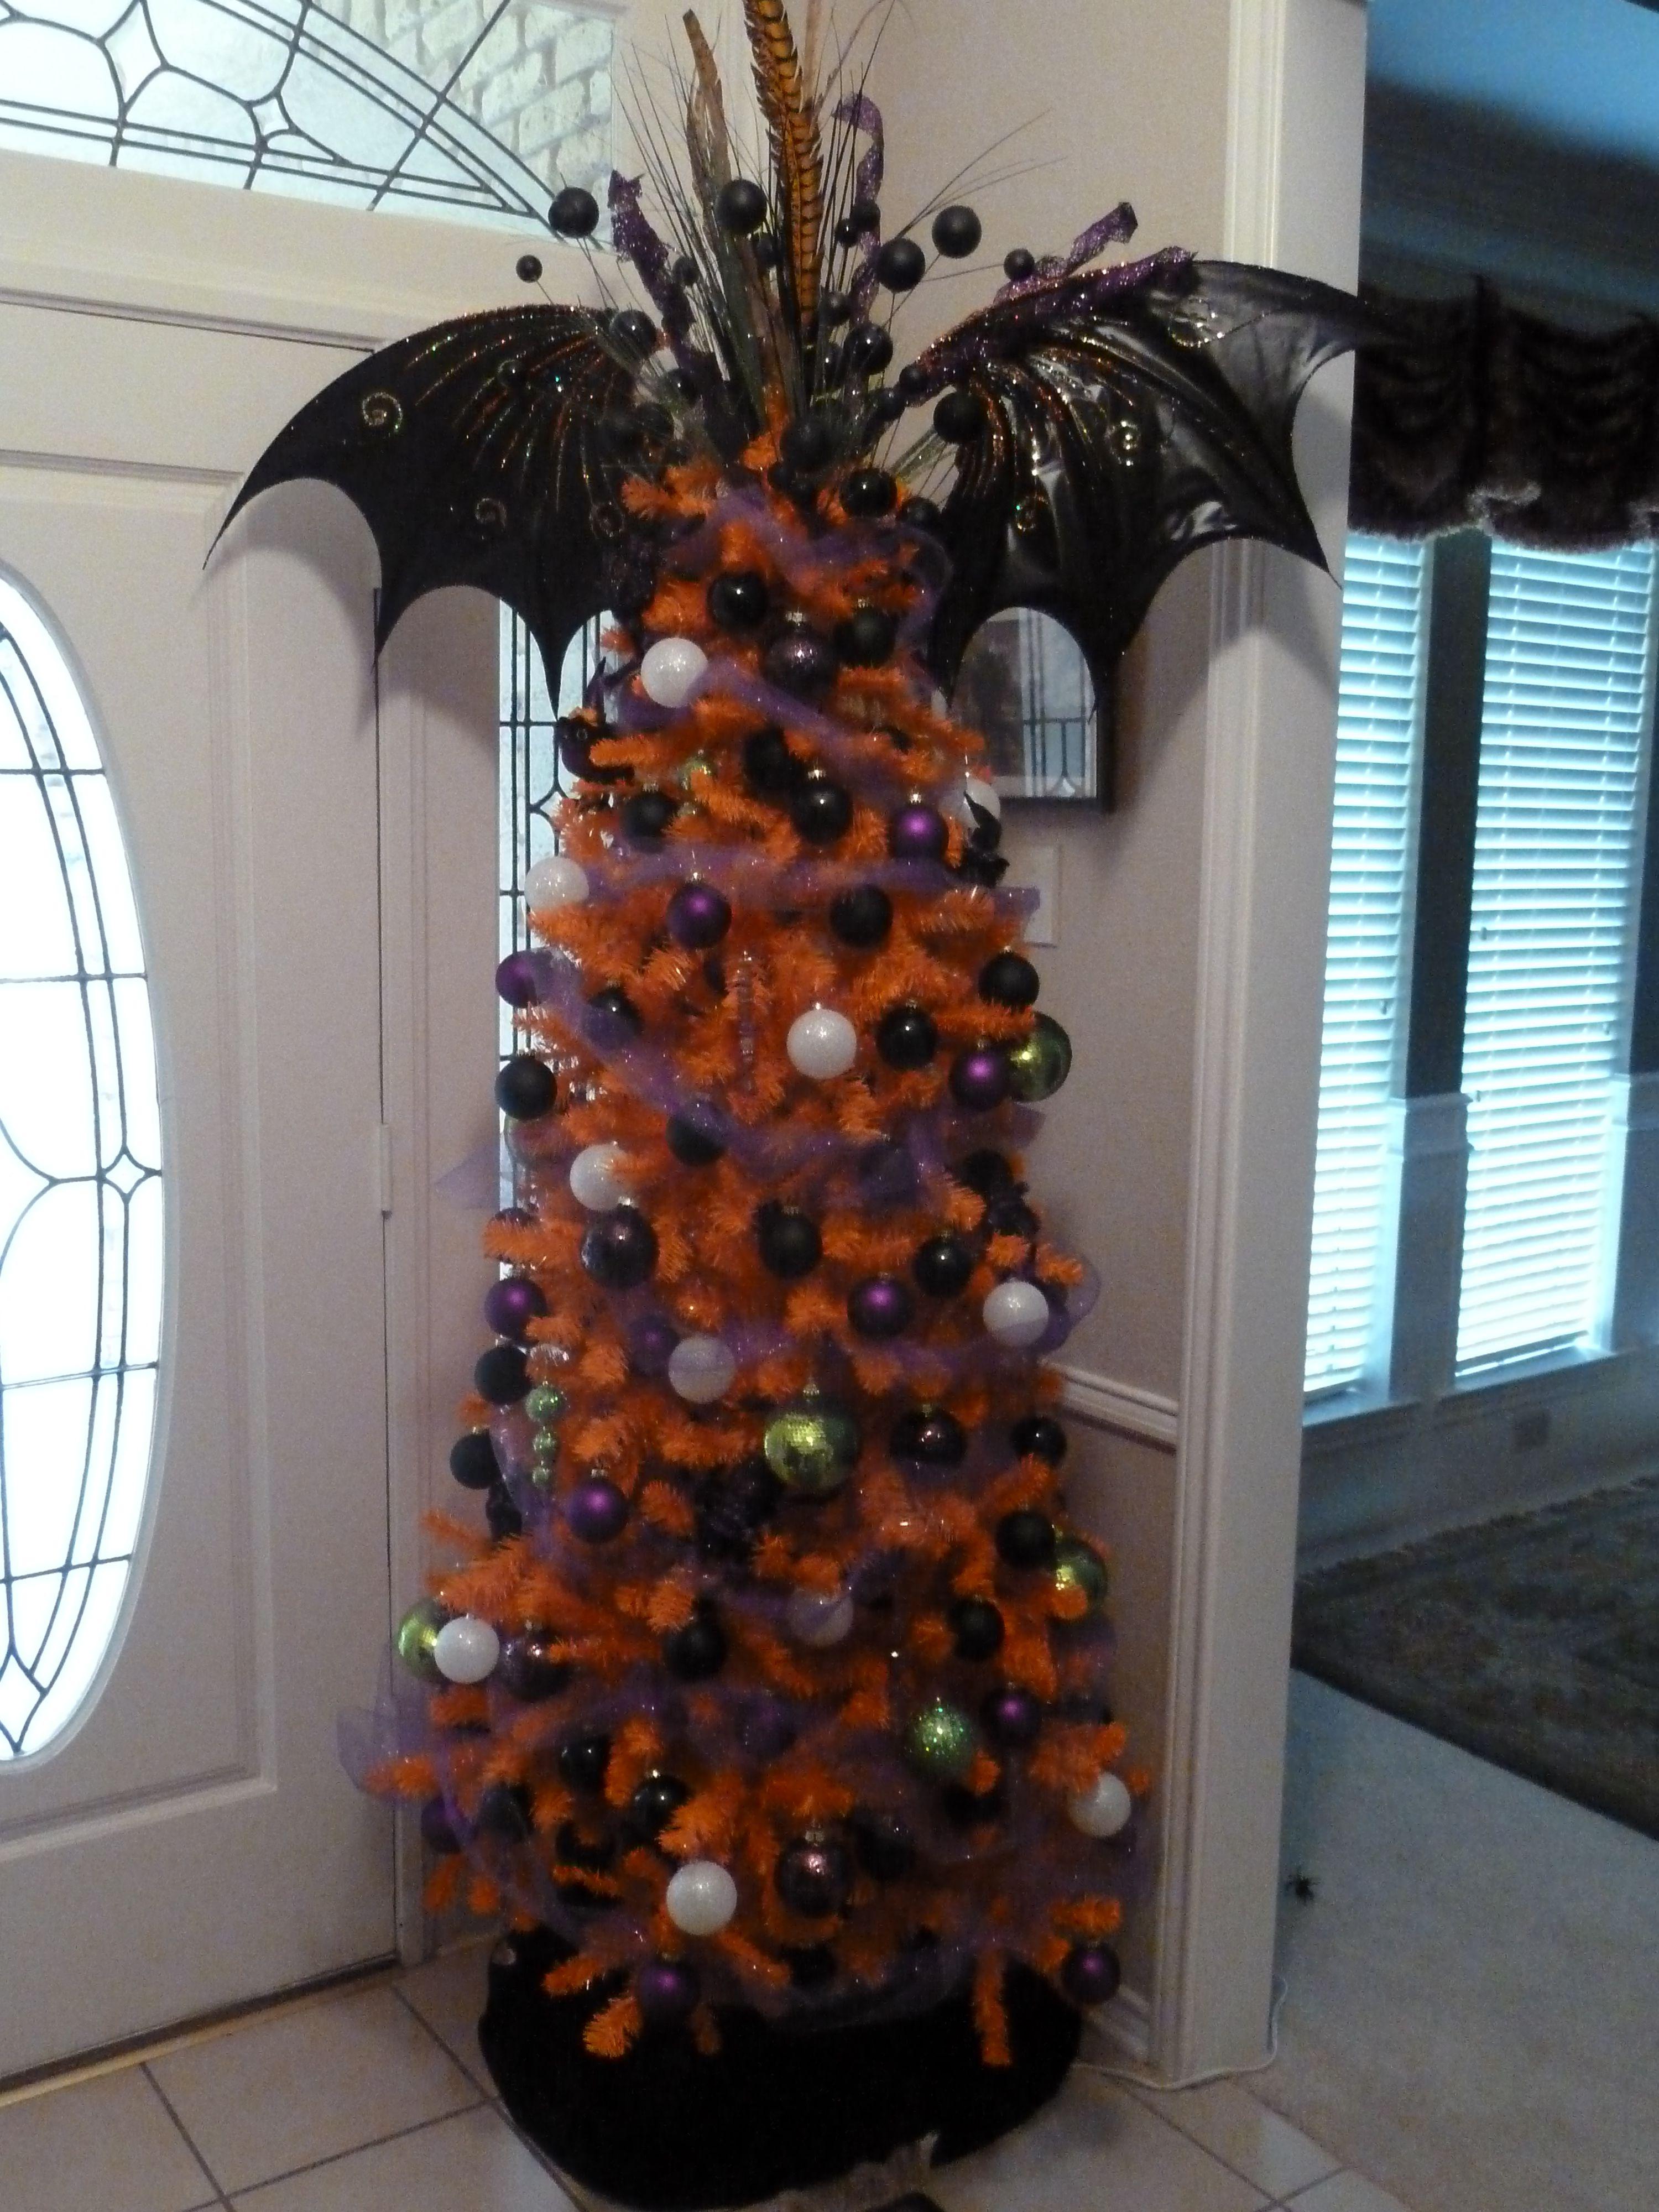 13 Days of Creepmas Creepy Christmas Tree Toppers